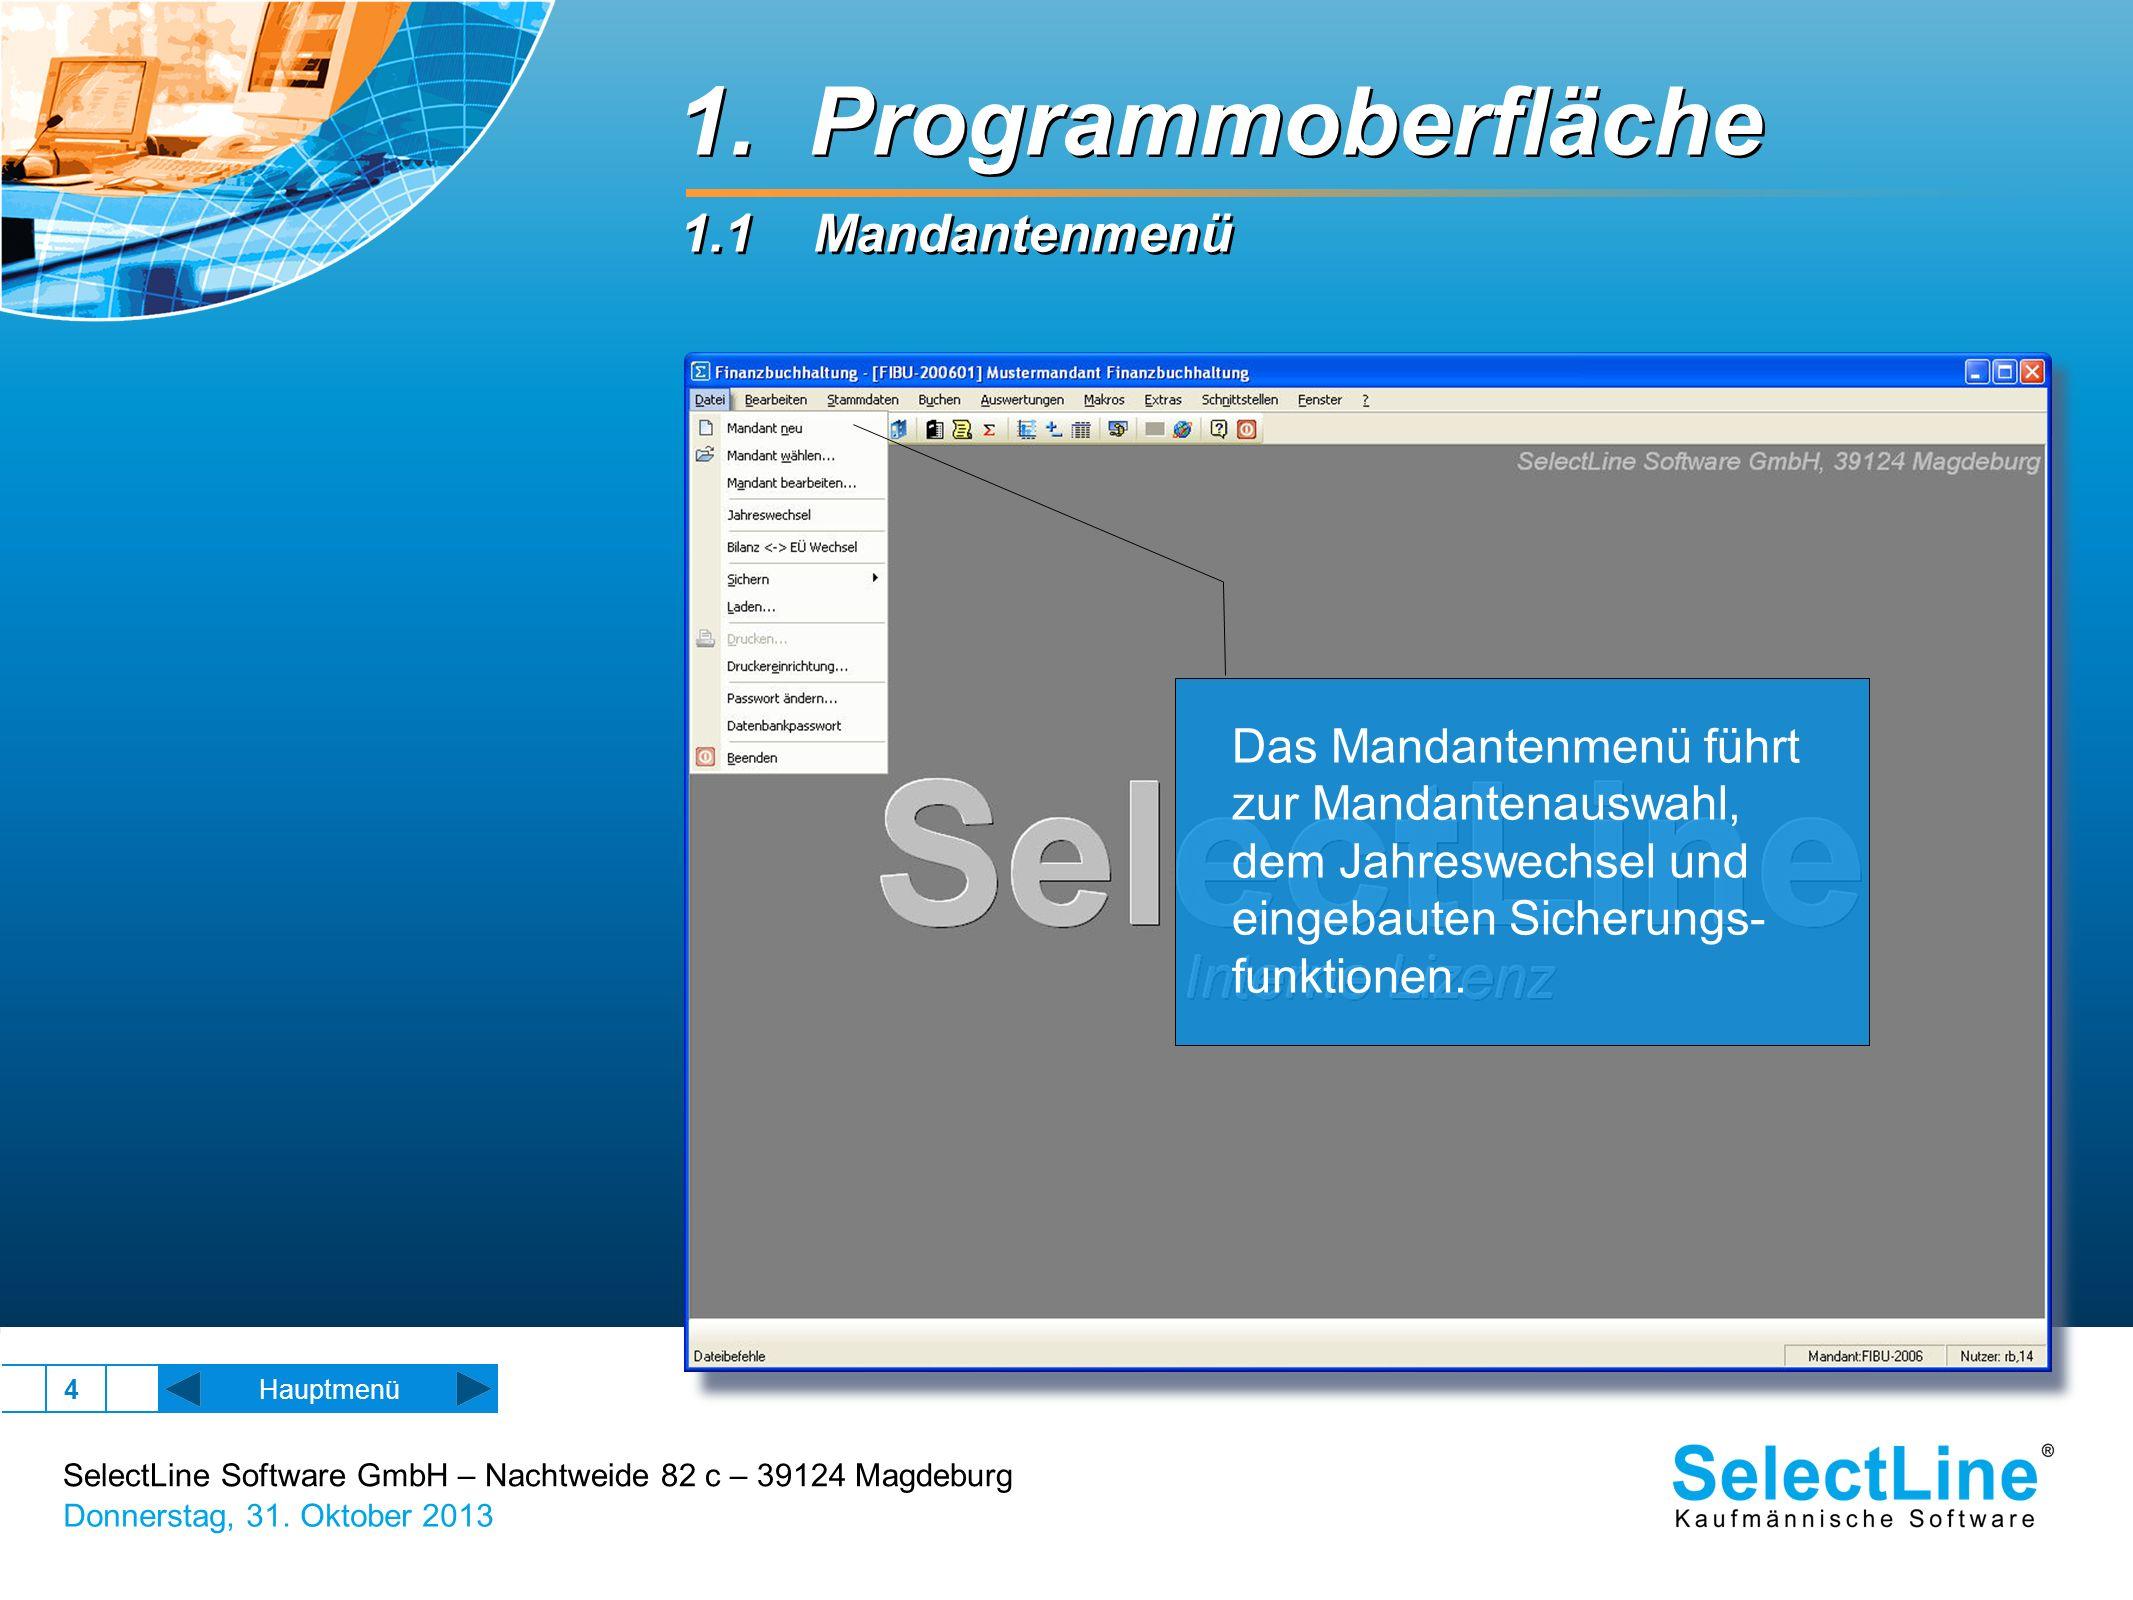 1. Programmoberfläche 1.1 Mandantenmenü